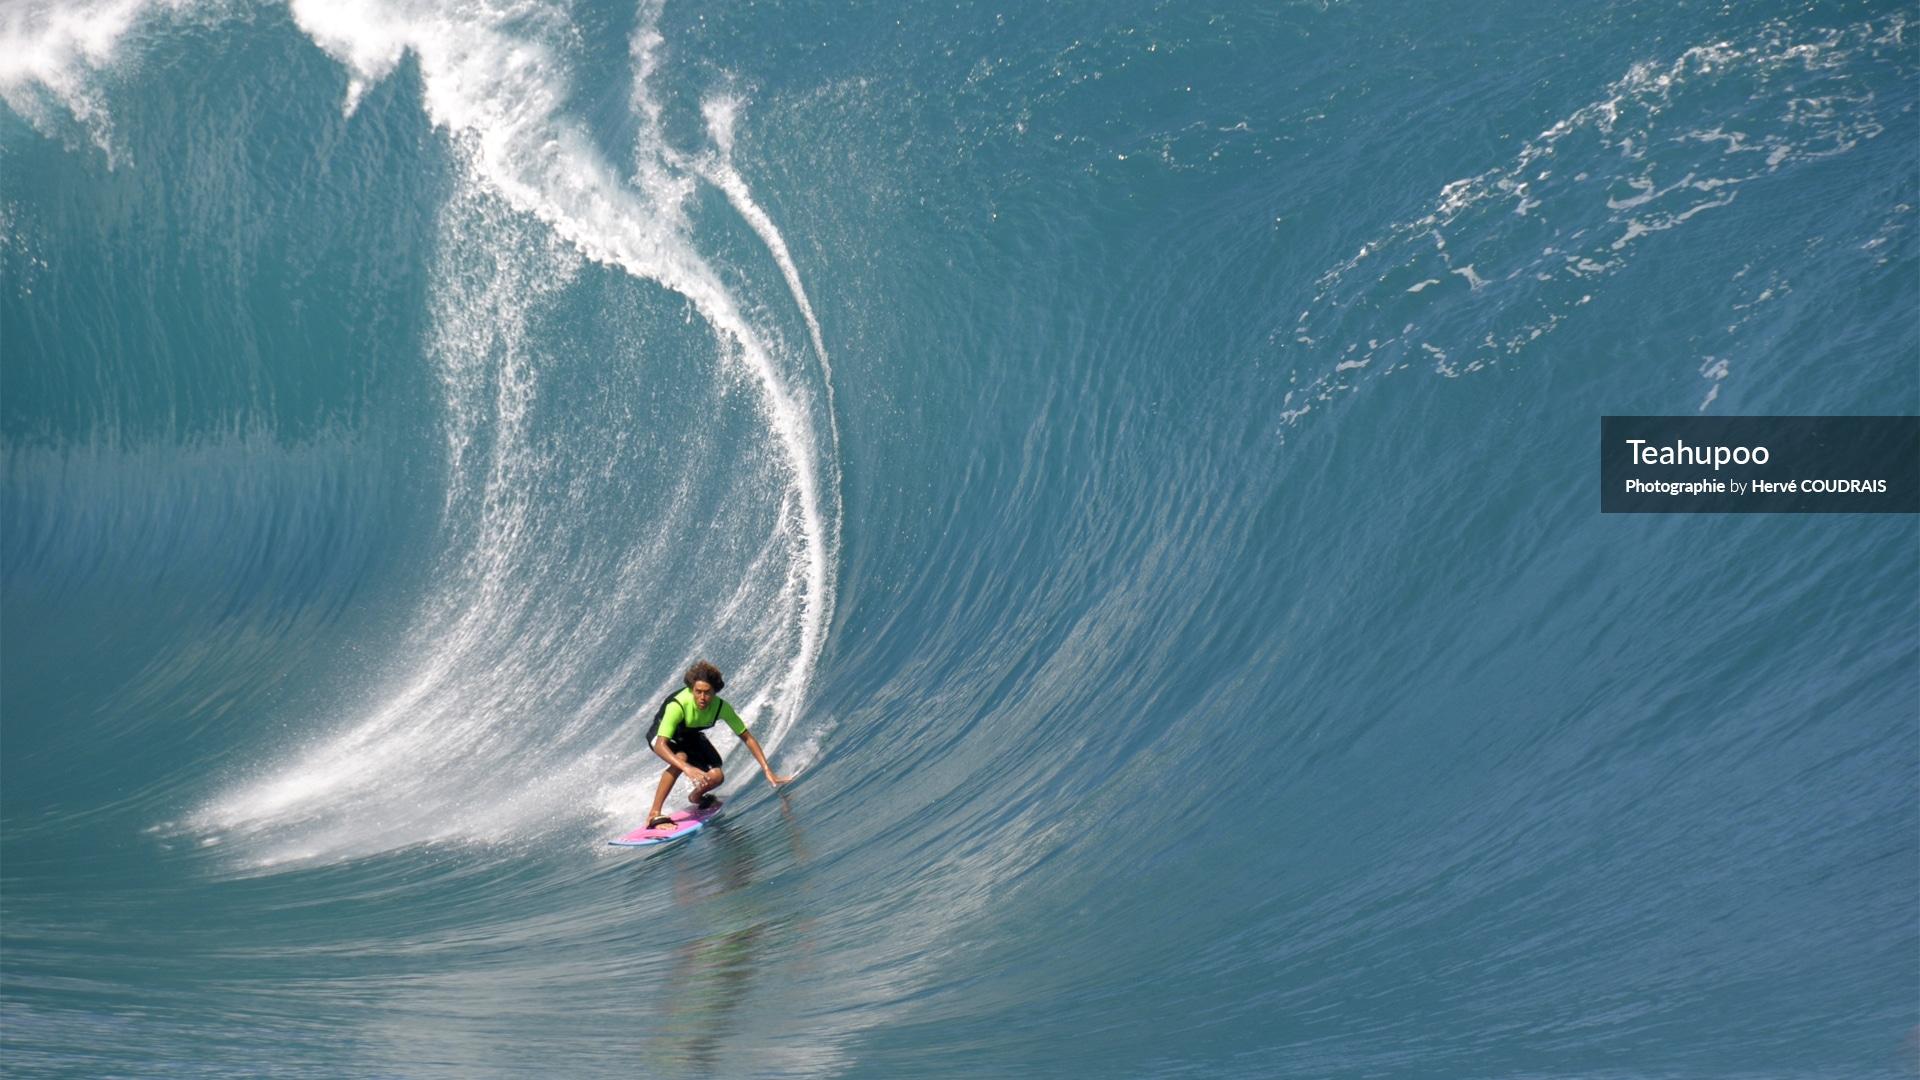 Photographie Hervé Coudrais, surf, vagues géantes, Teahupoo, Tahiti, Polynésie, Polynésie française